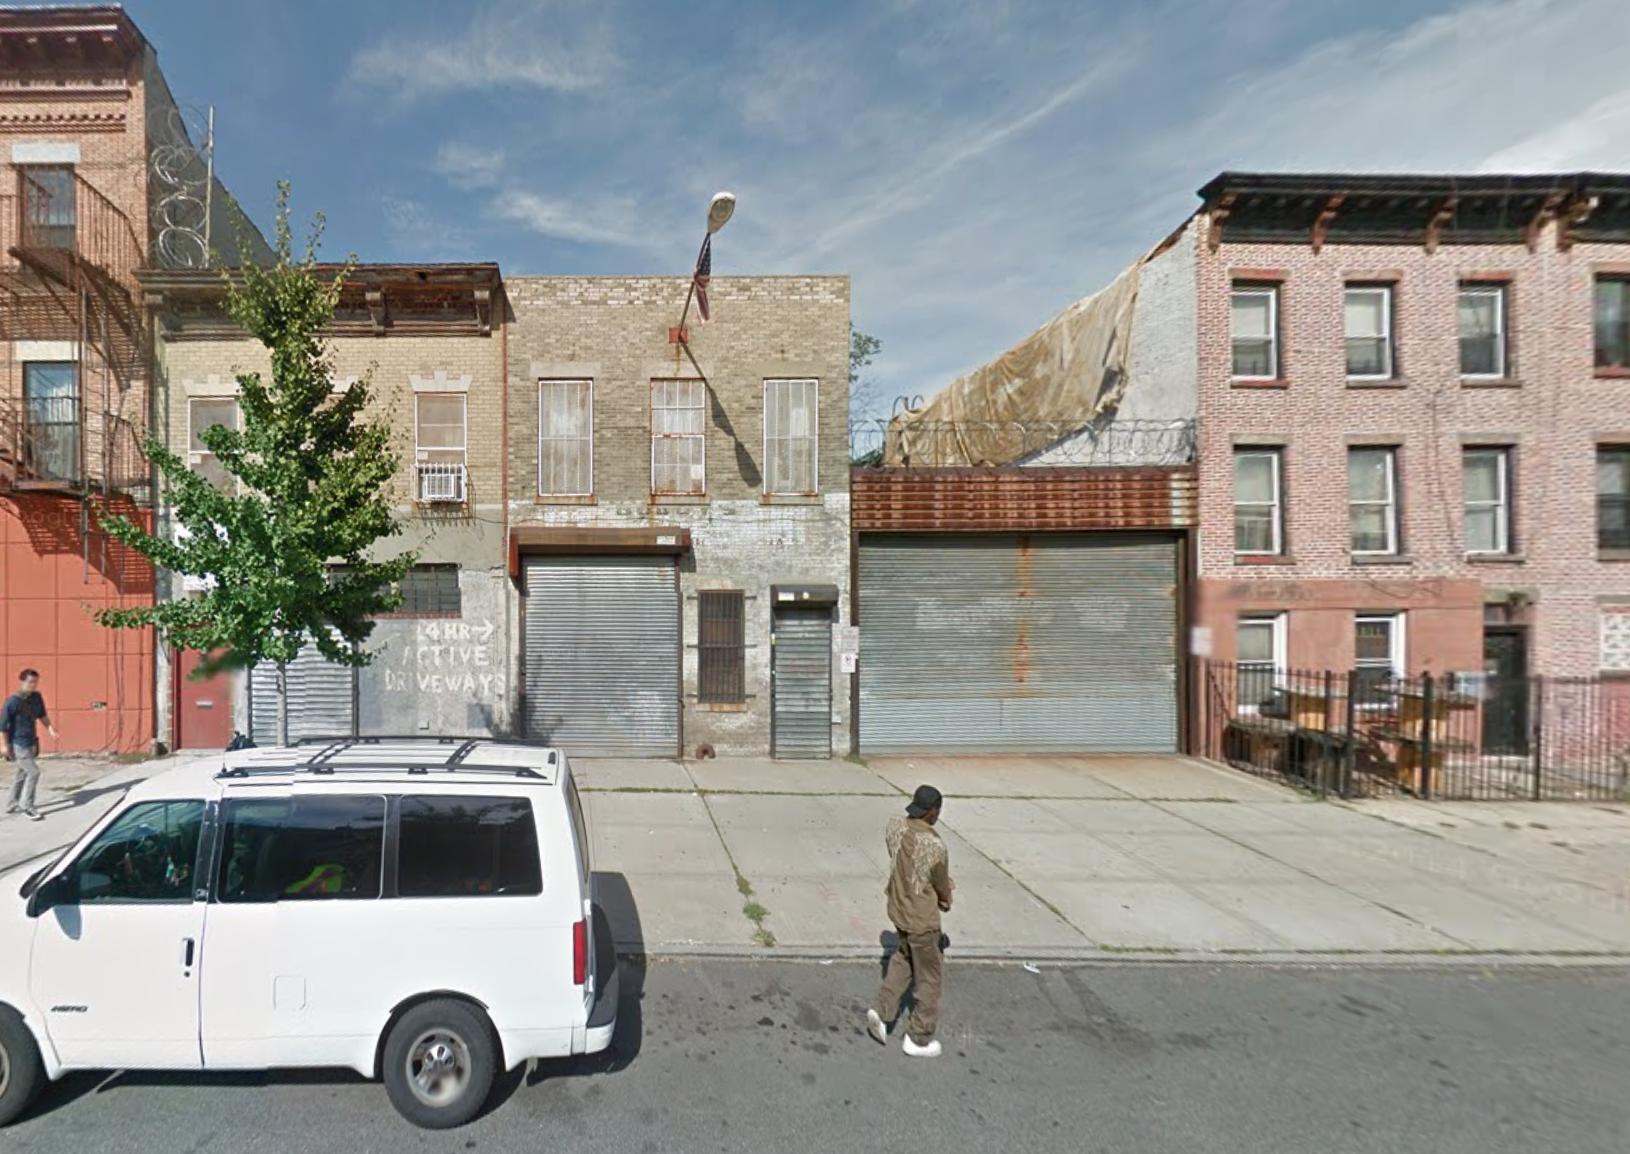 701 Prospect Place, image via Google Maps